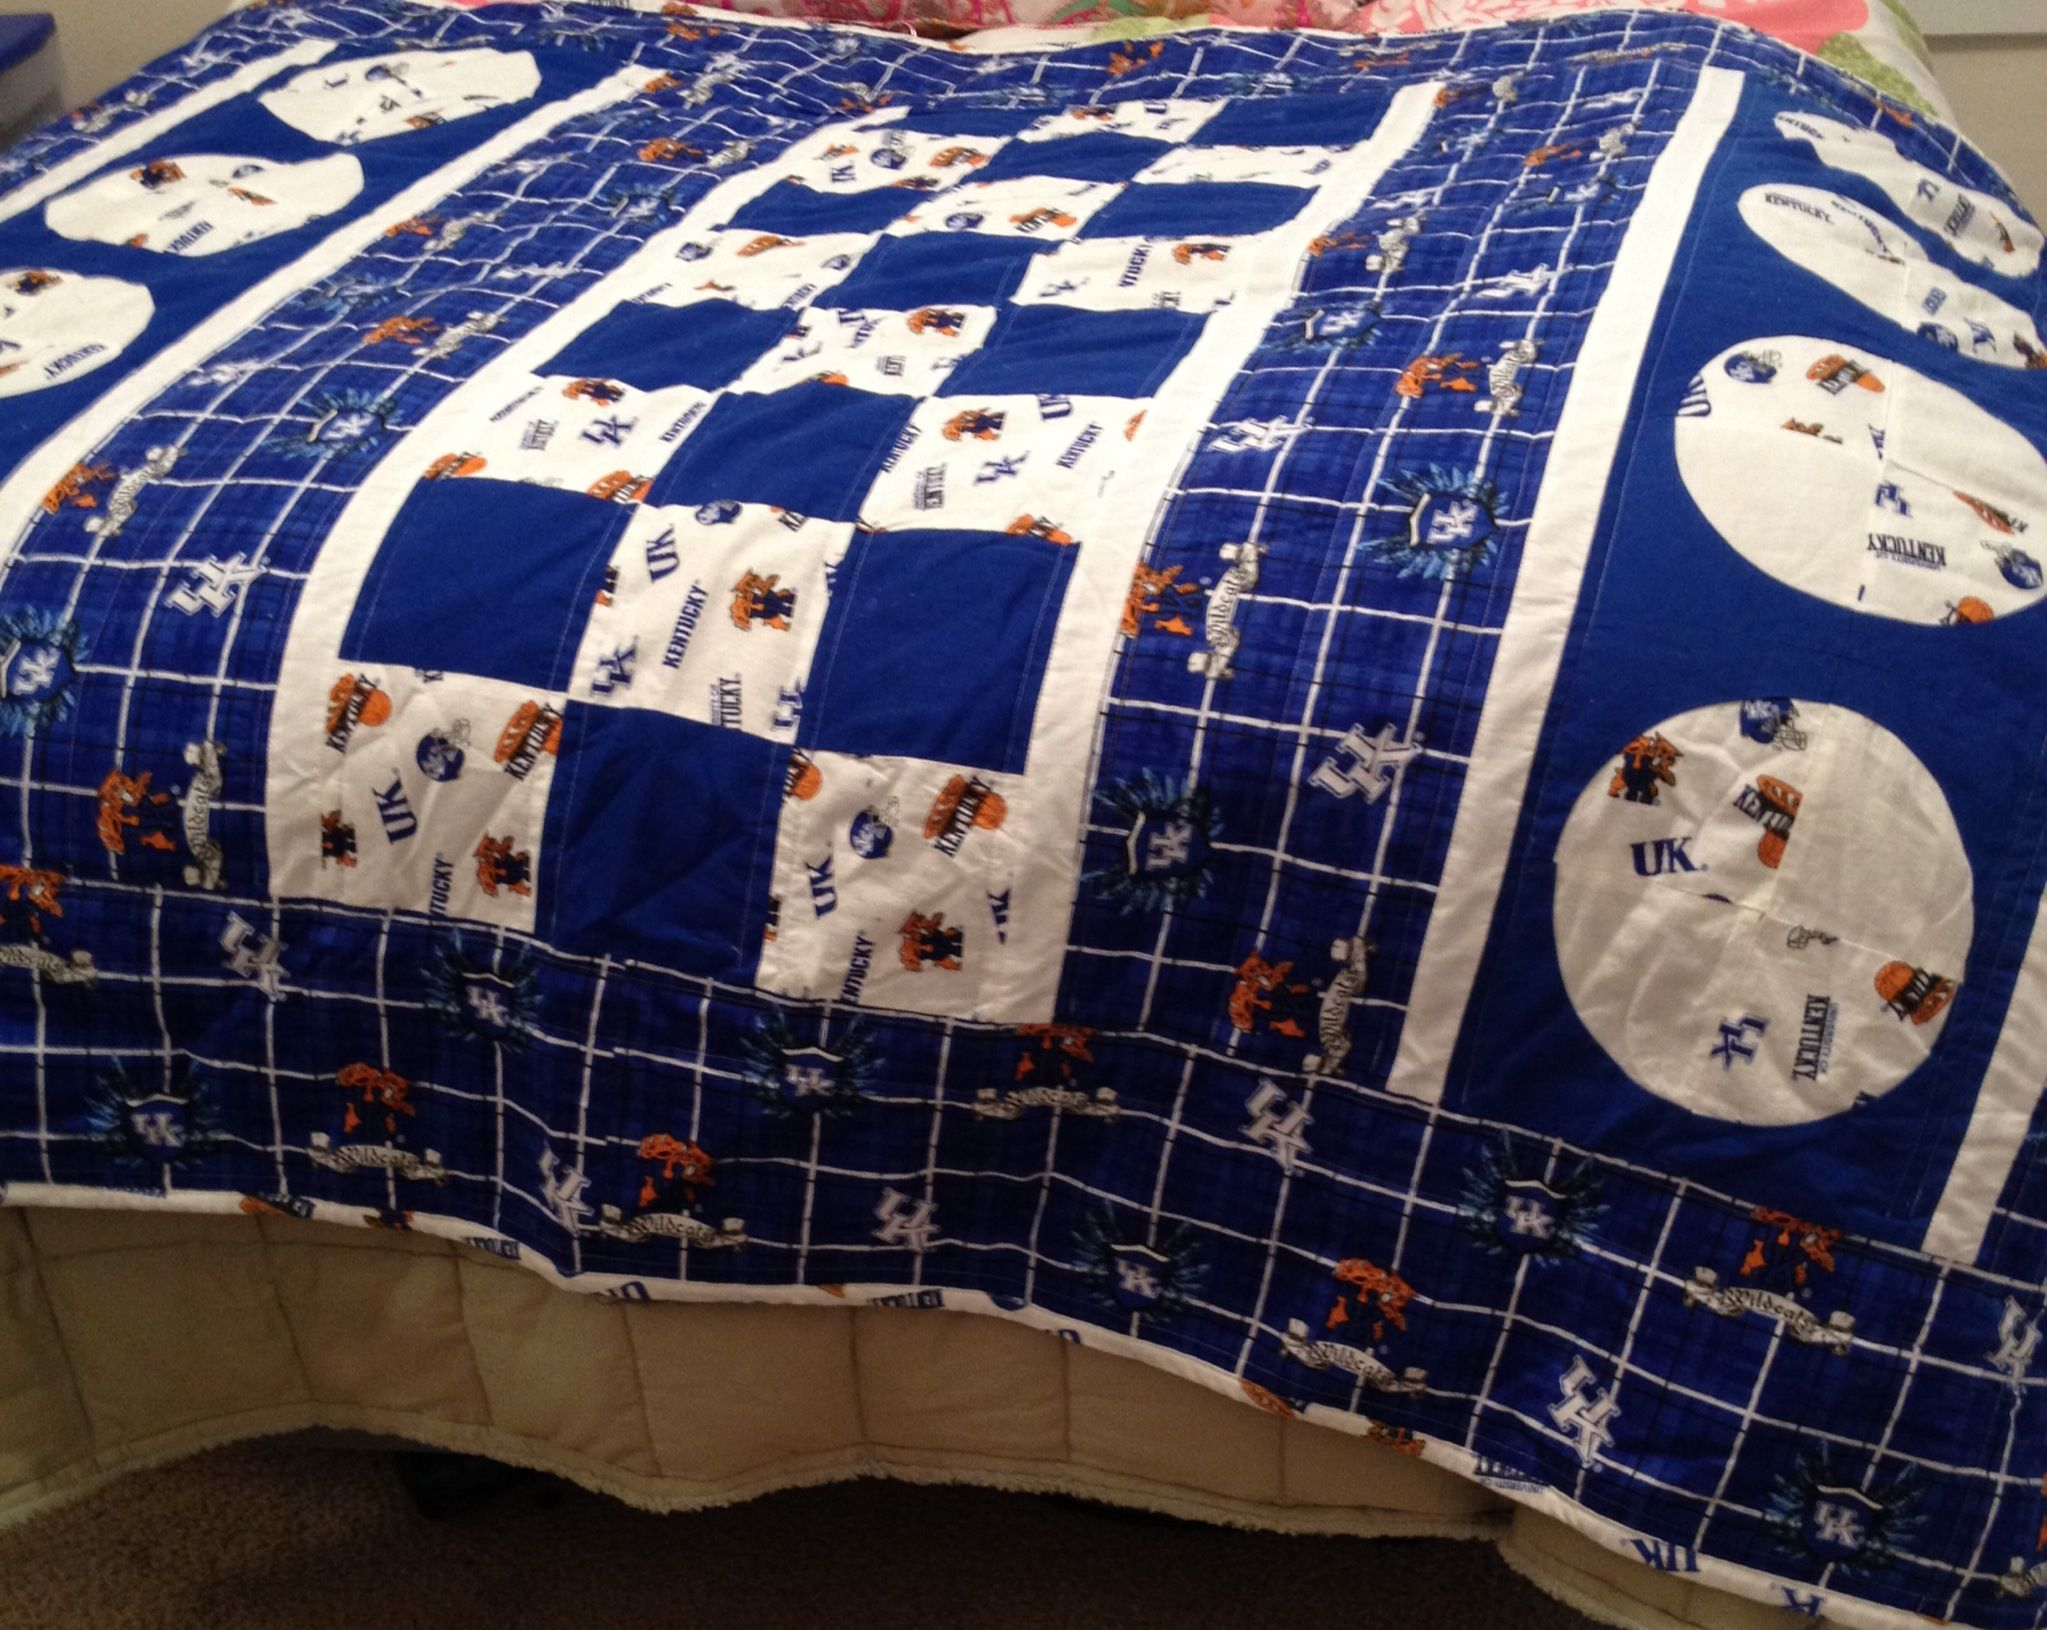 University of Kentucky quilt. Made by Tina Neathery of Quilting in ... : quilting university - Adamdwight.com